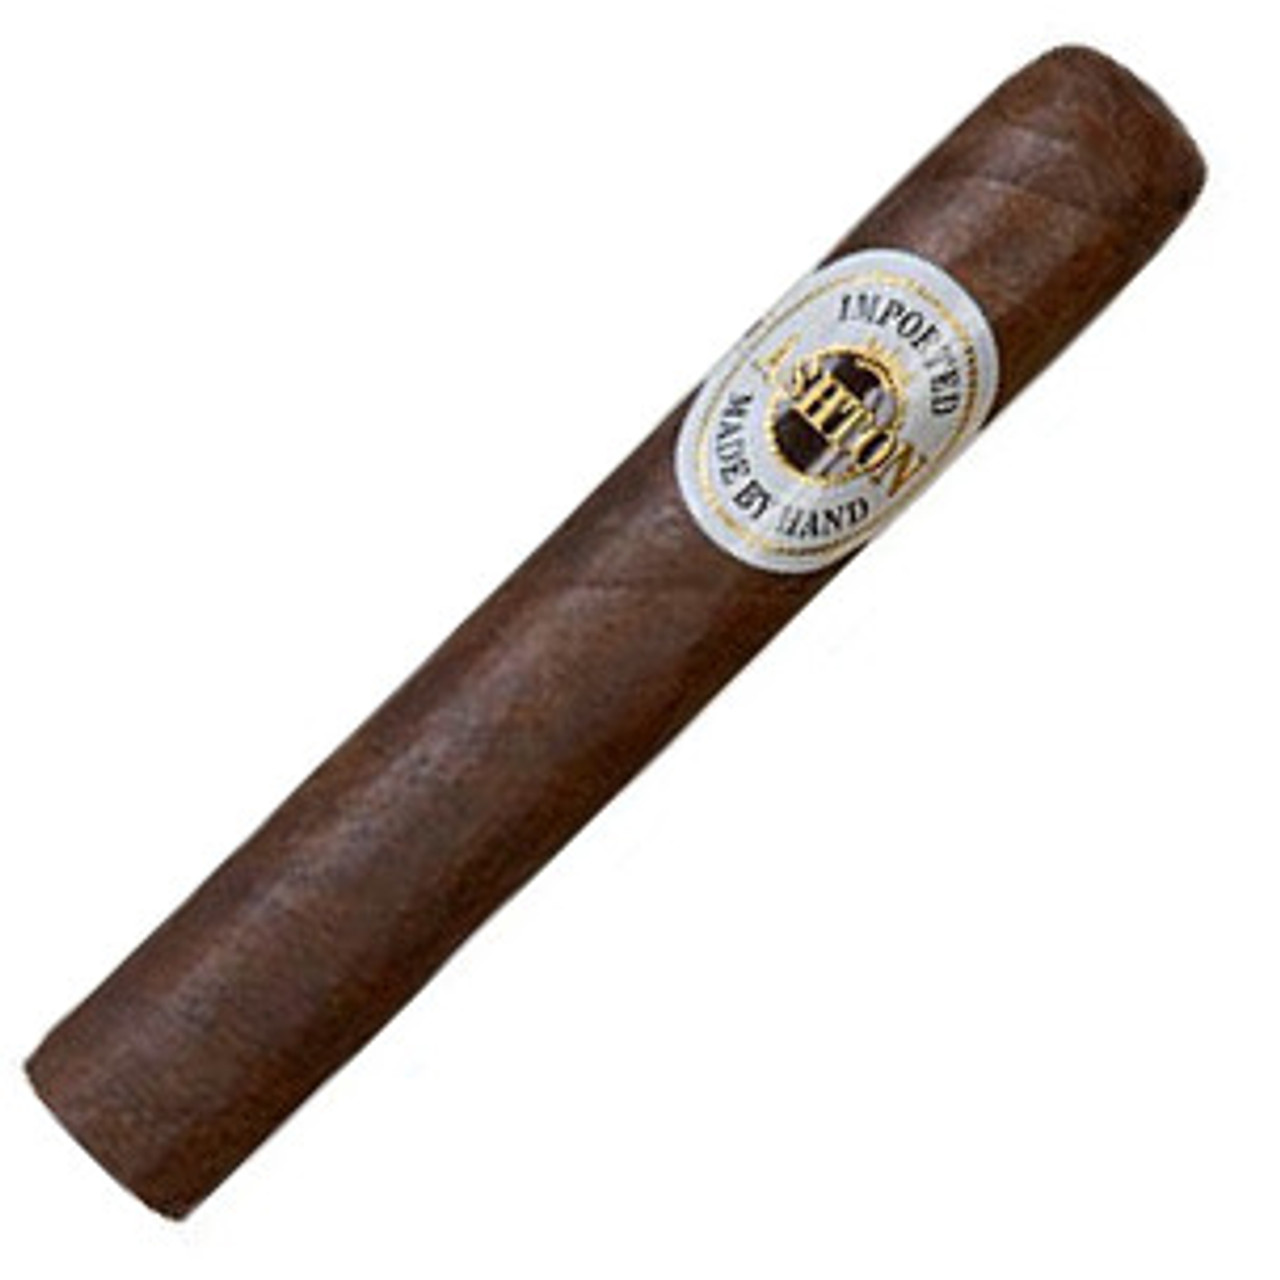 Ashton Aged Maduro No. 10 Cigars - 5 x 50 (Cedar Chest of 25)